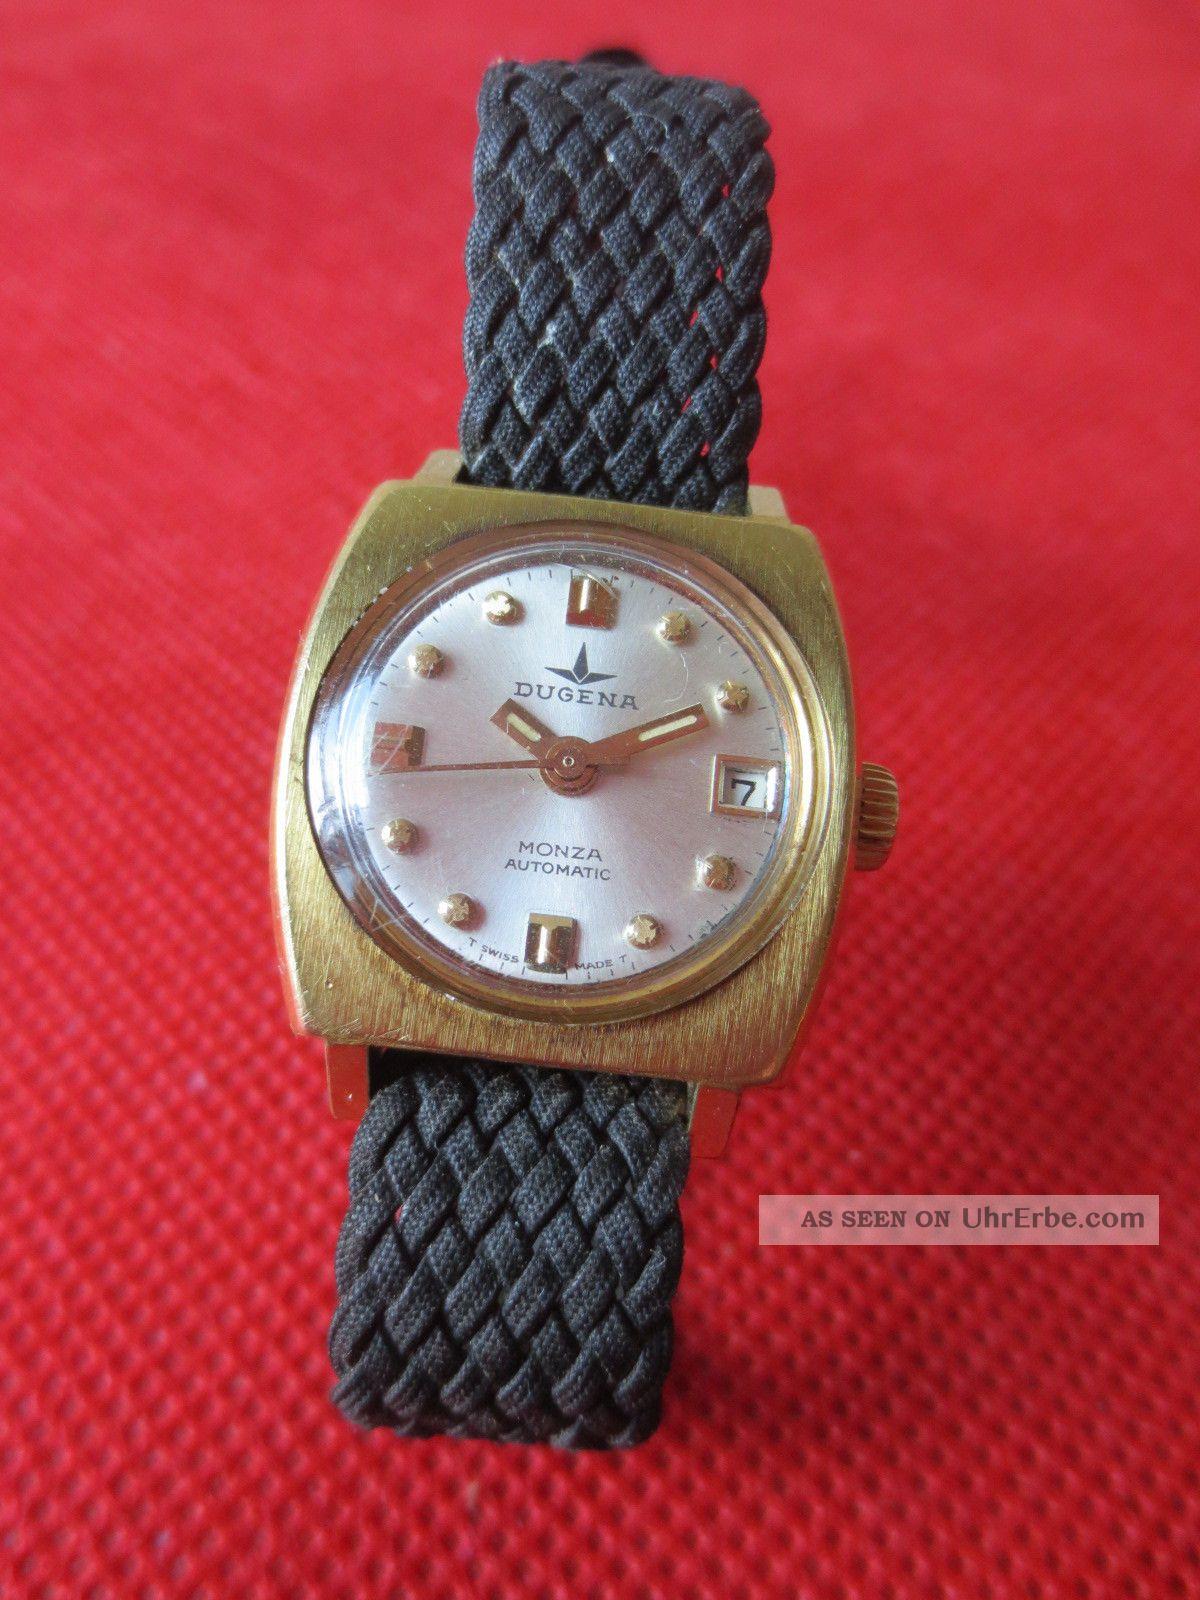 Dugena Monza Automatic Damen Armbanduhr - 3309 - Vintage Wristwatch - Selfwinding Armbanduhren Bild